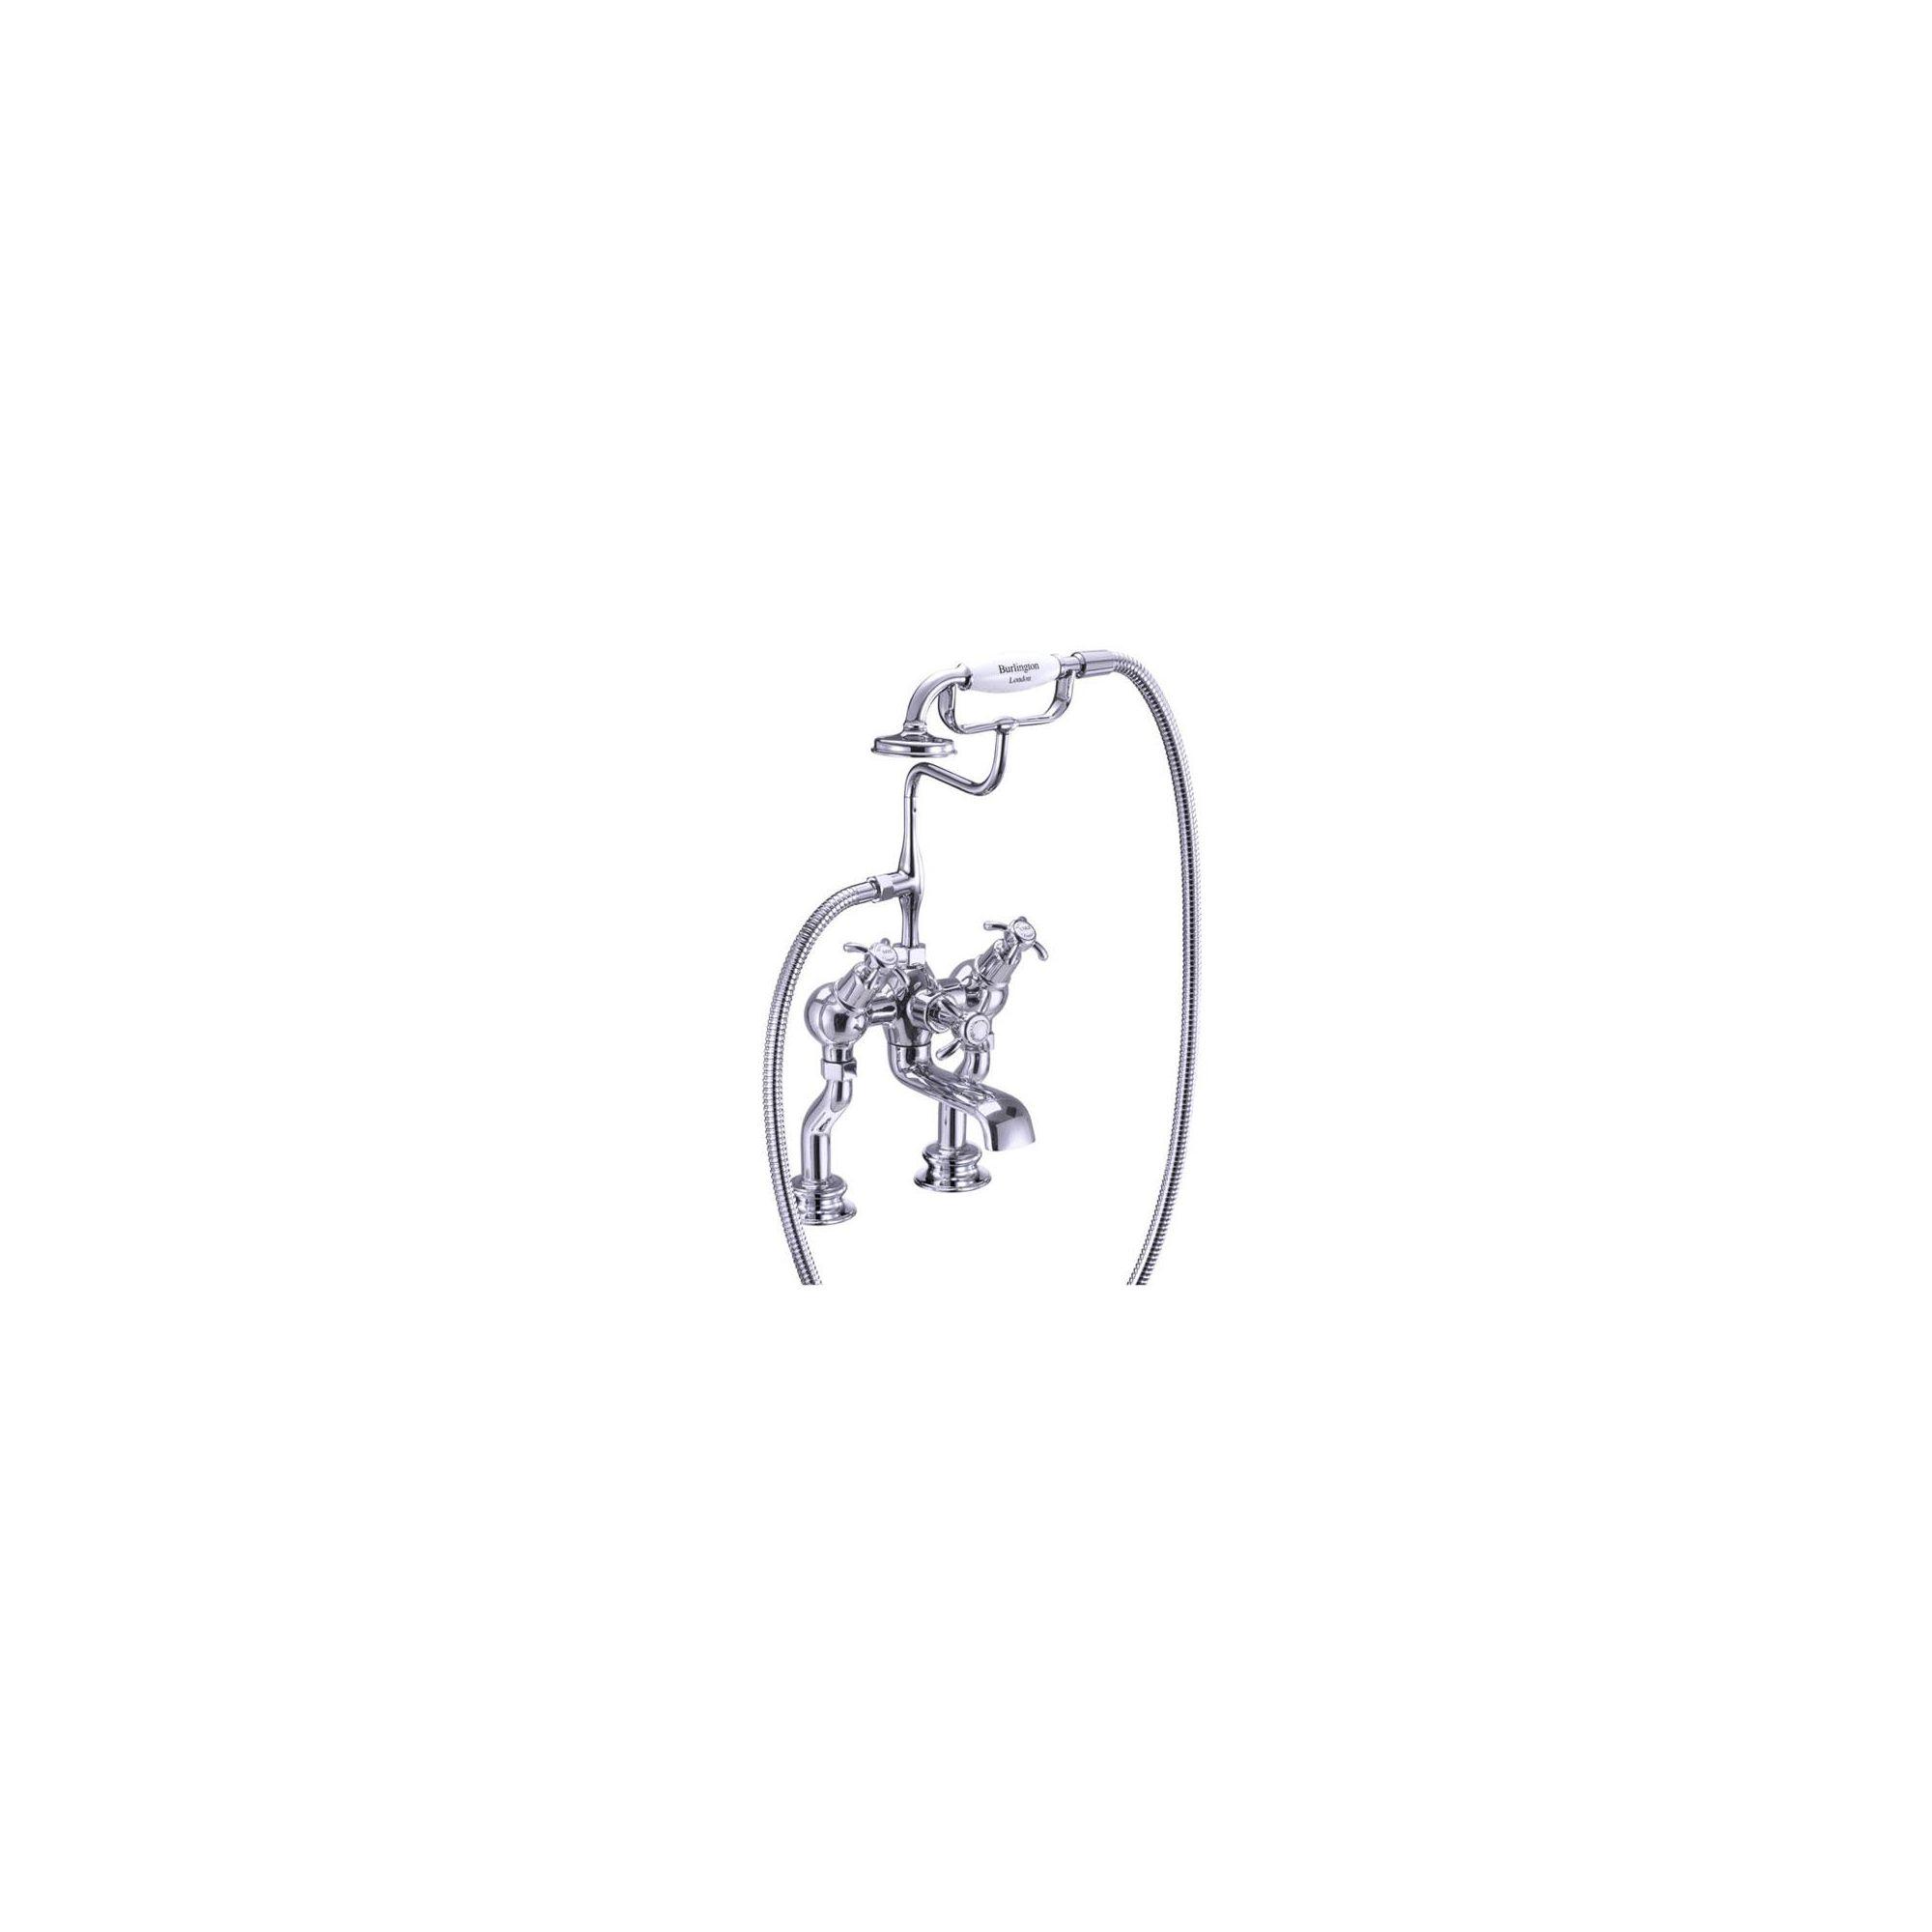 Burlington Anglesey Regent Angled Bath Shower Tap, Pillar Mounted, Chrome at Tesco Direct